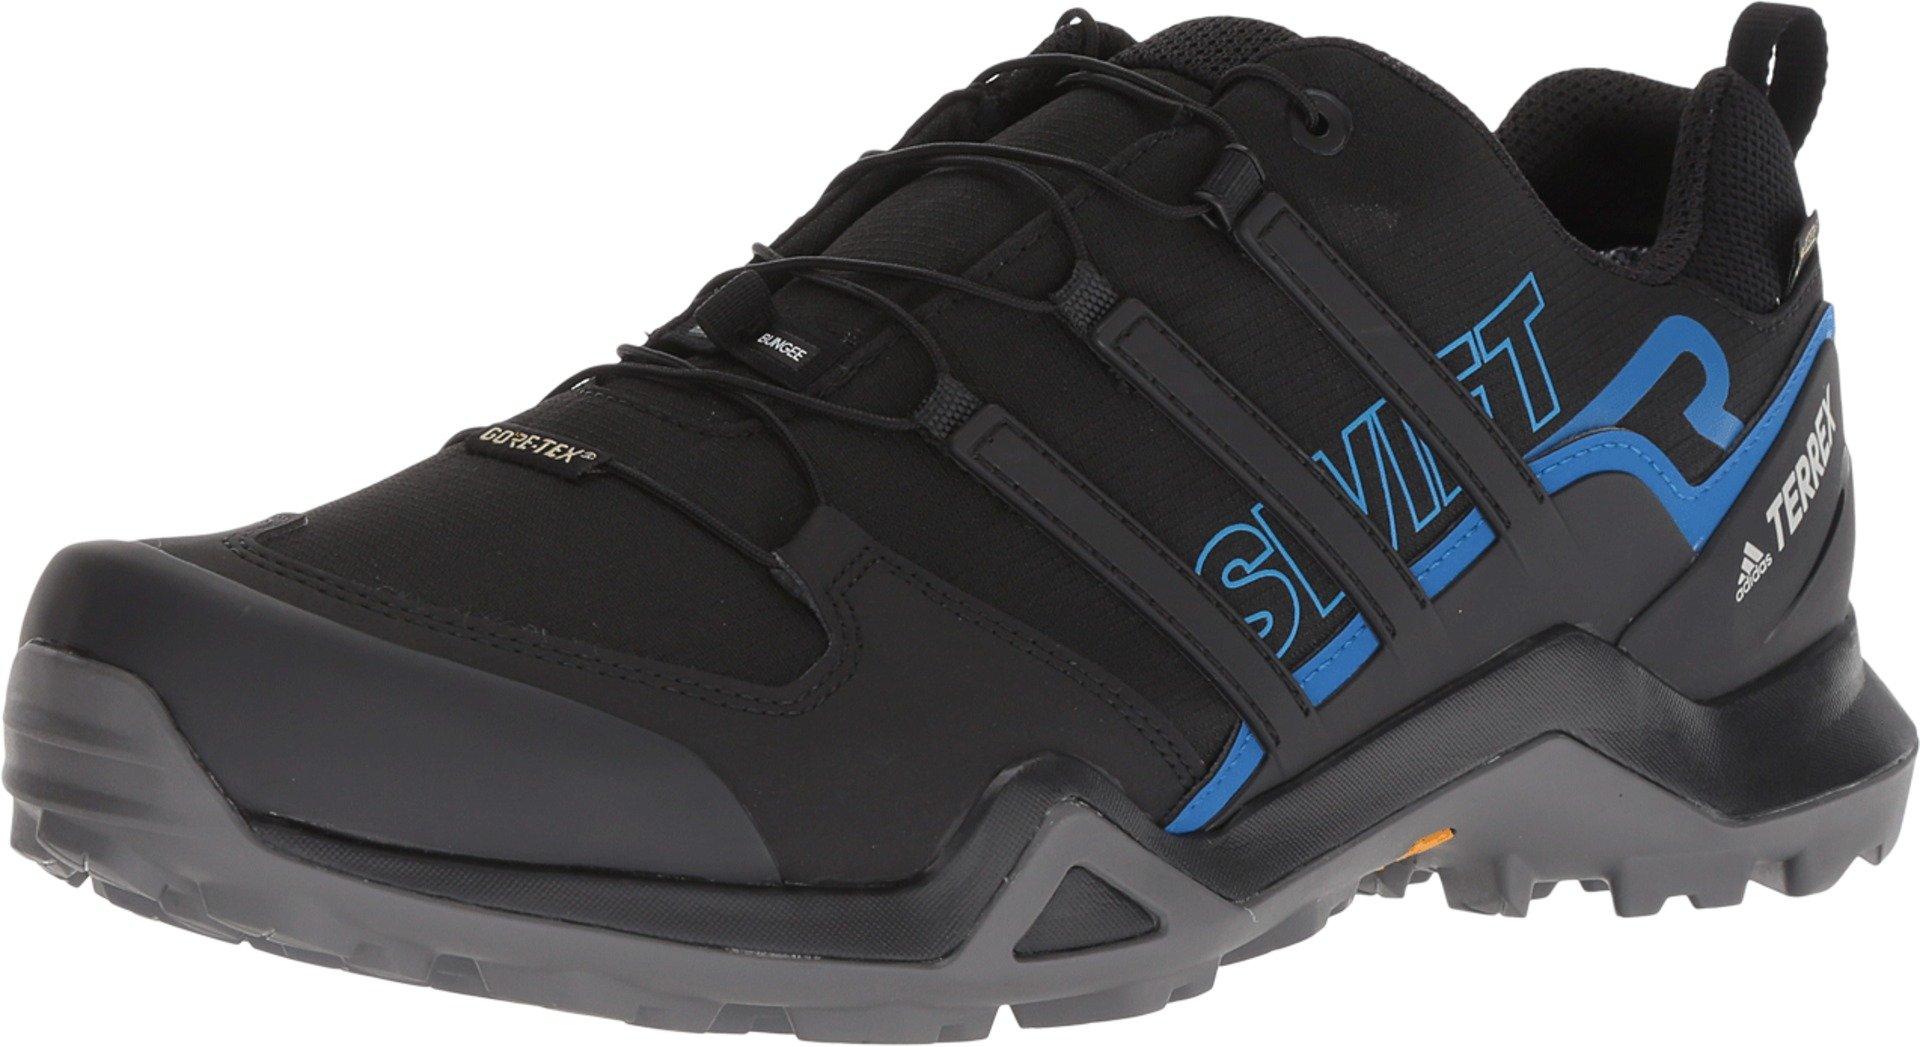 adidas outdoor Men's Terrex Swift R2 GTX¿ Black/Black/Bright Blue 9 D US